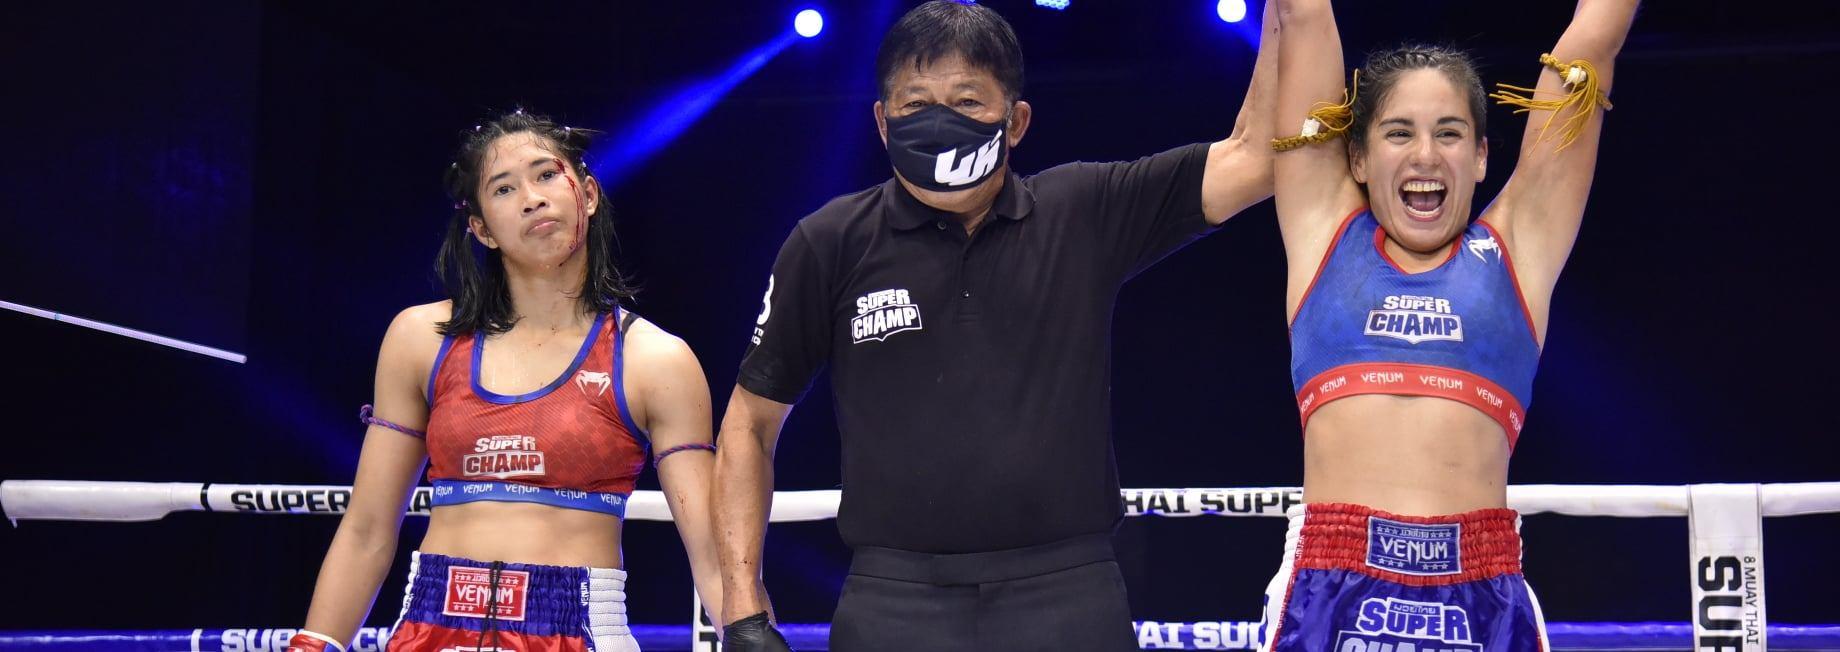 Daniela Lopez - Female Muay Thai - Muay Hardcore, Super Champ